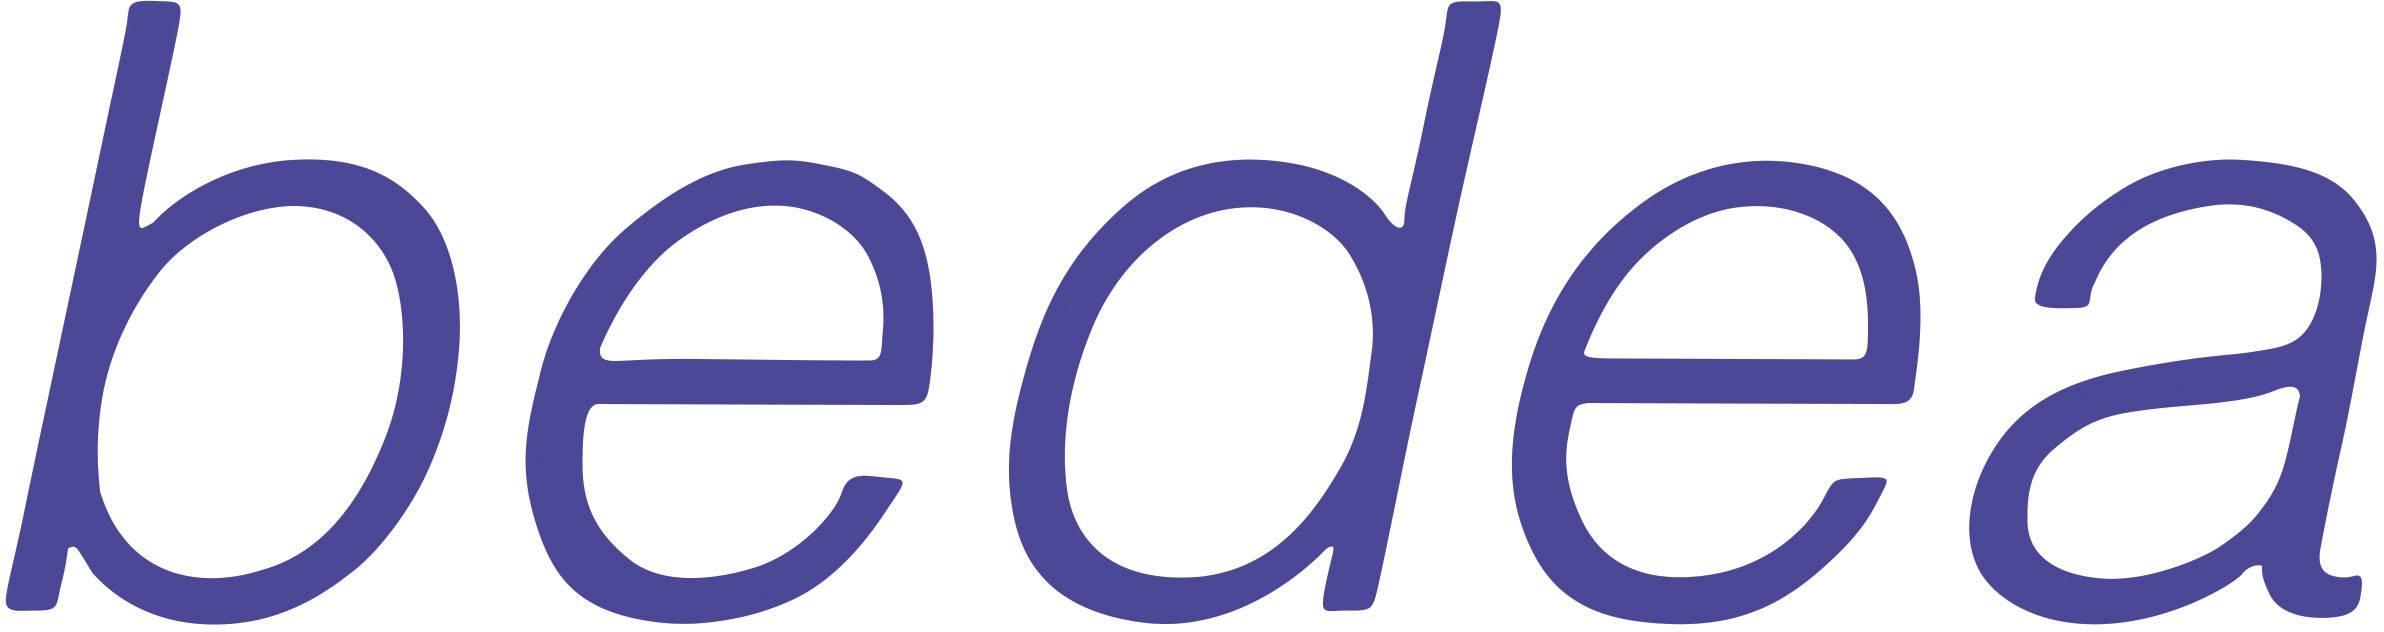 Bedea